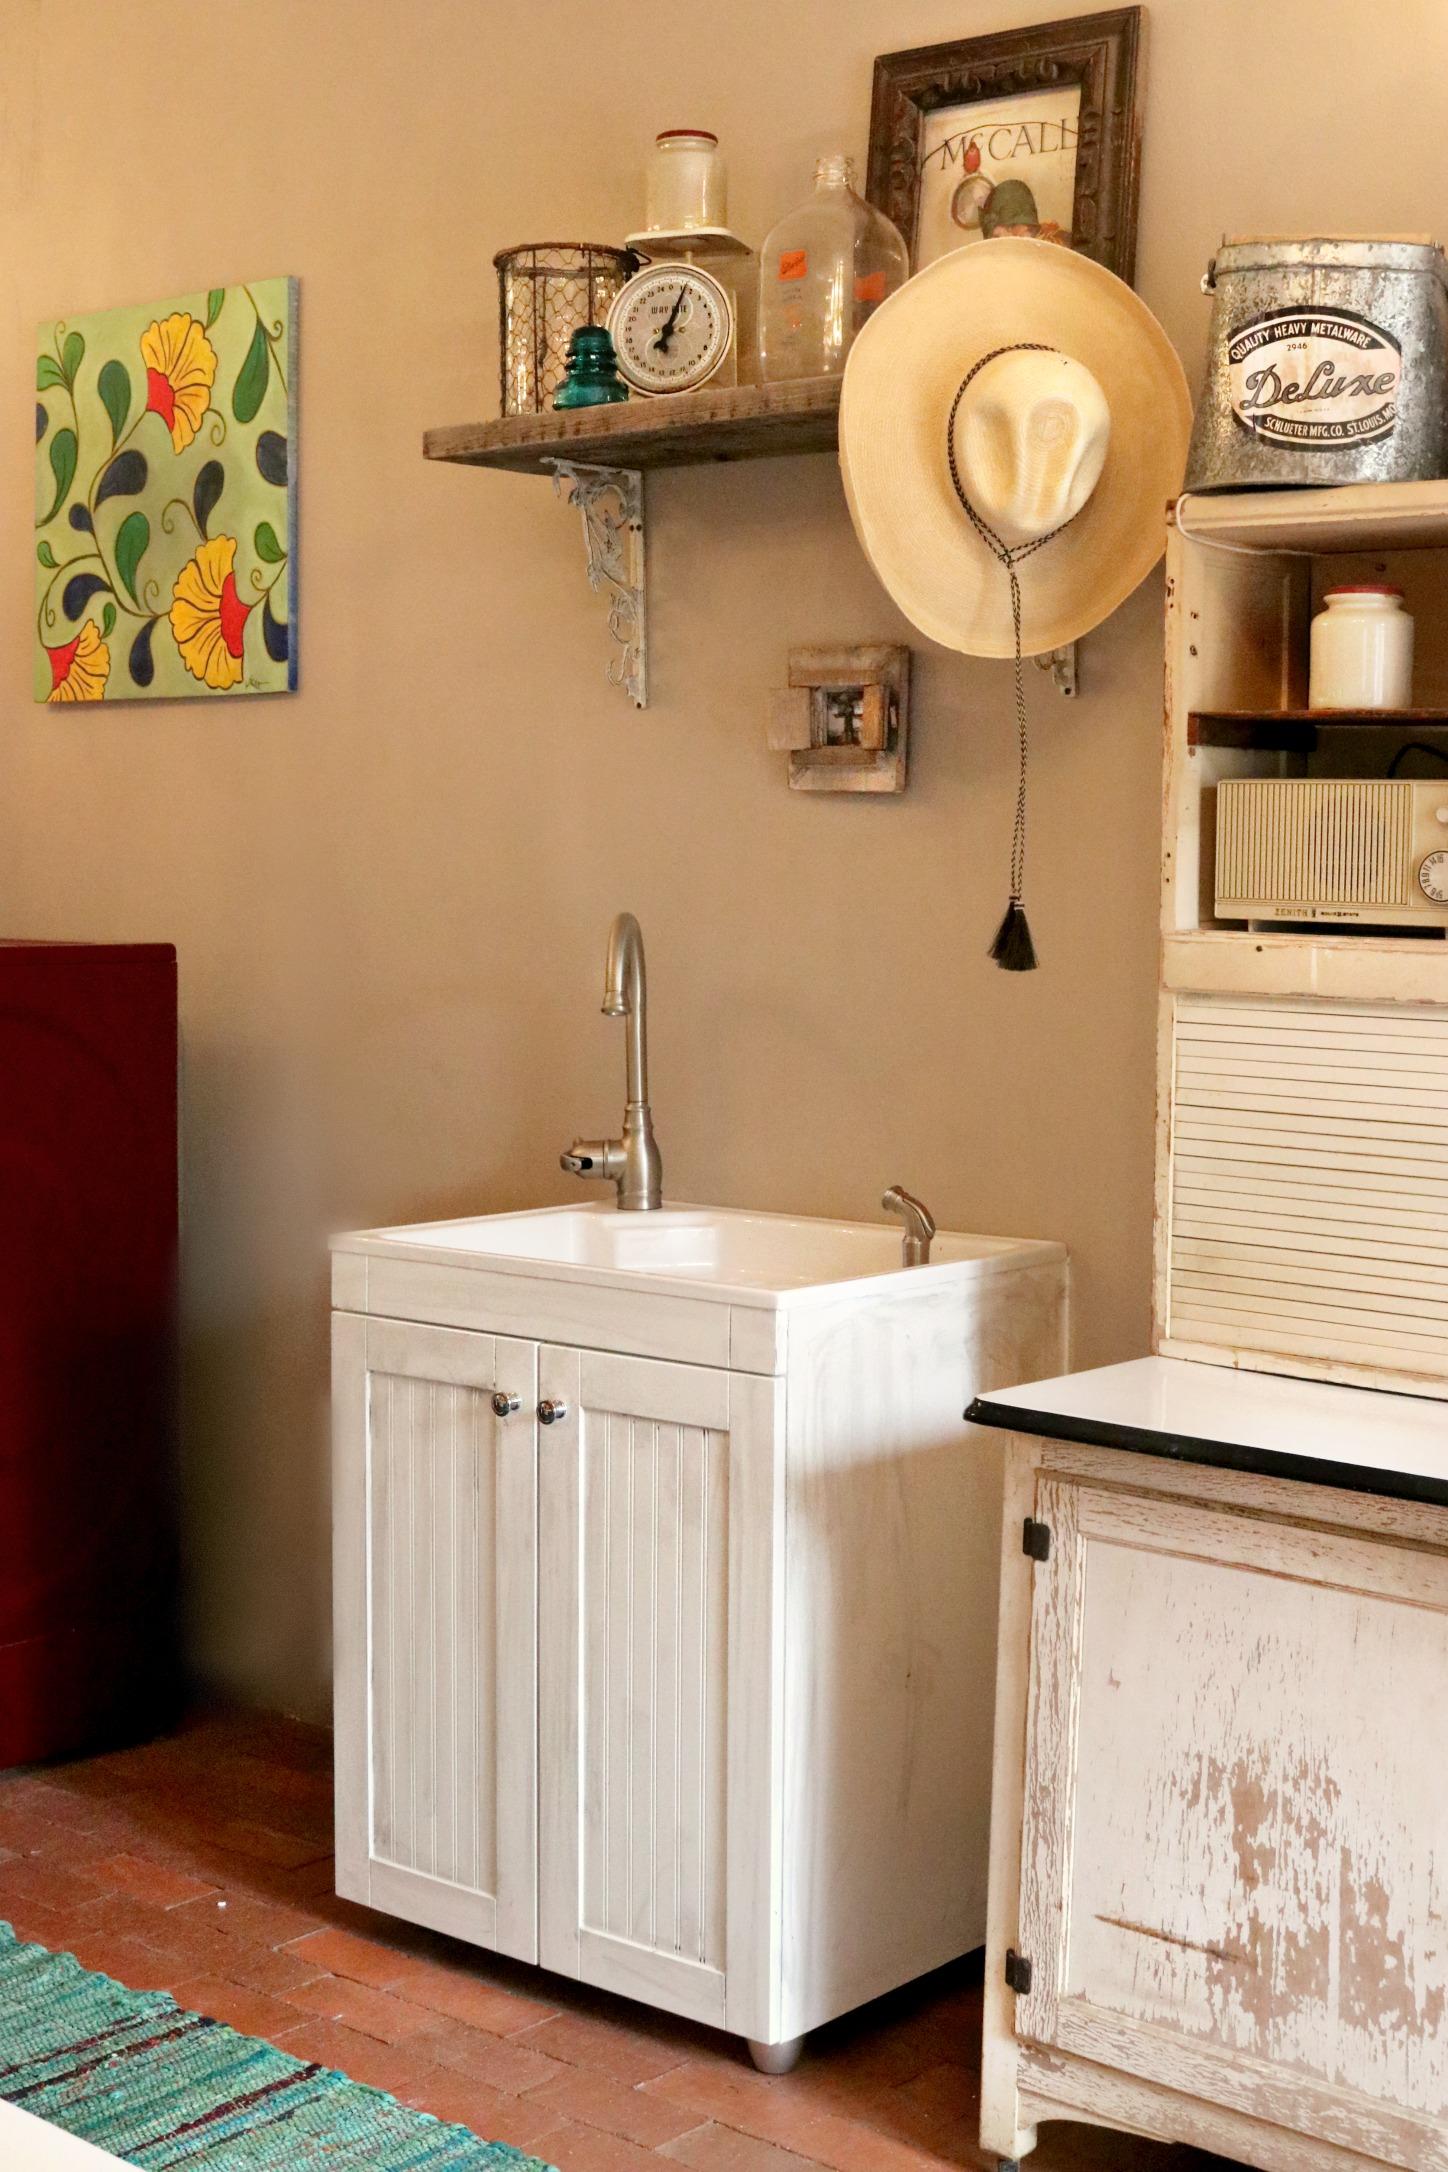 New Utility Sink